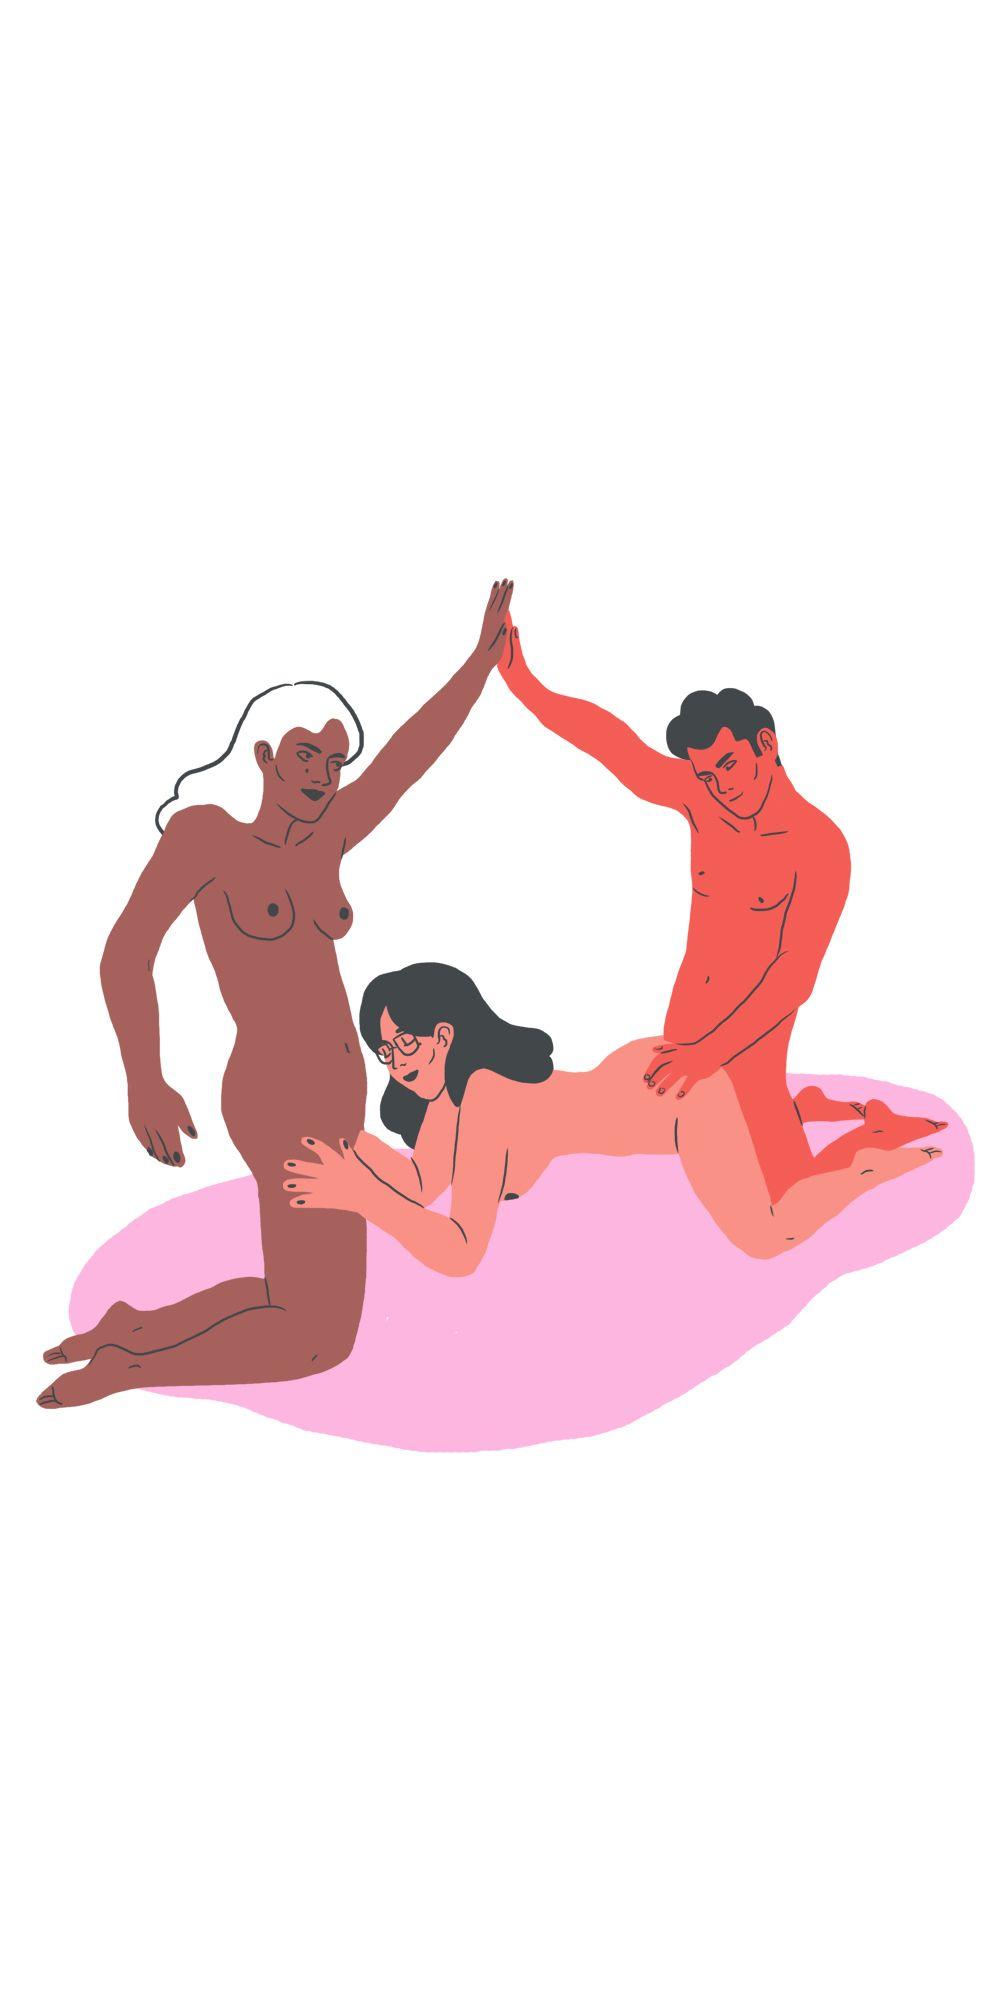 Effiel tower sex position